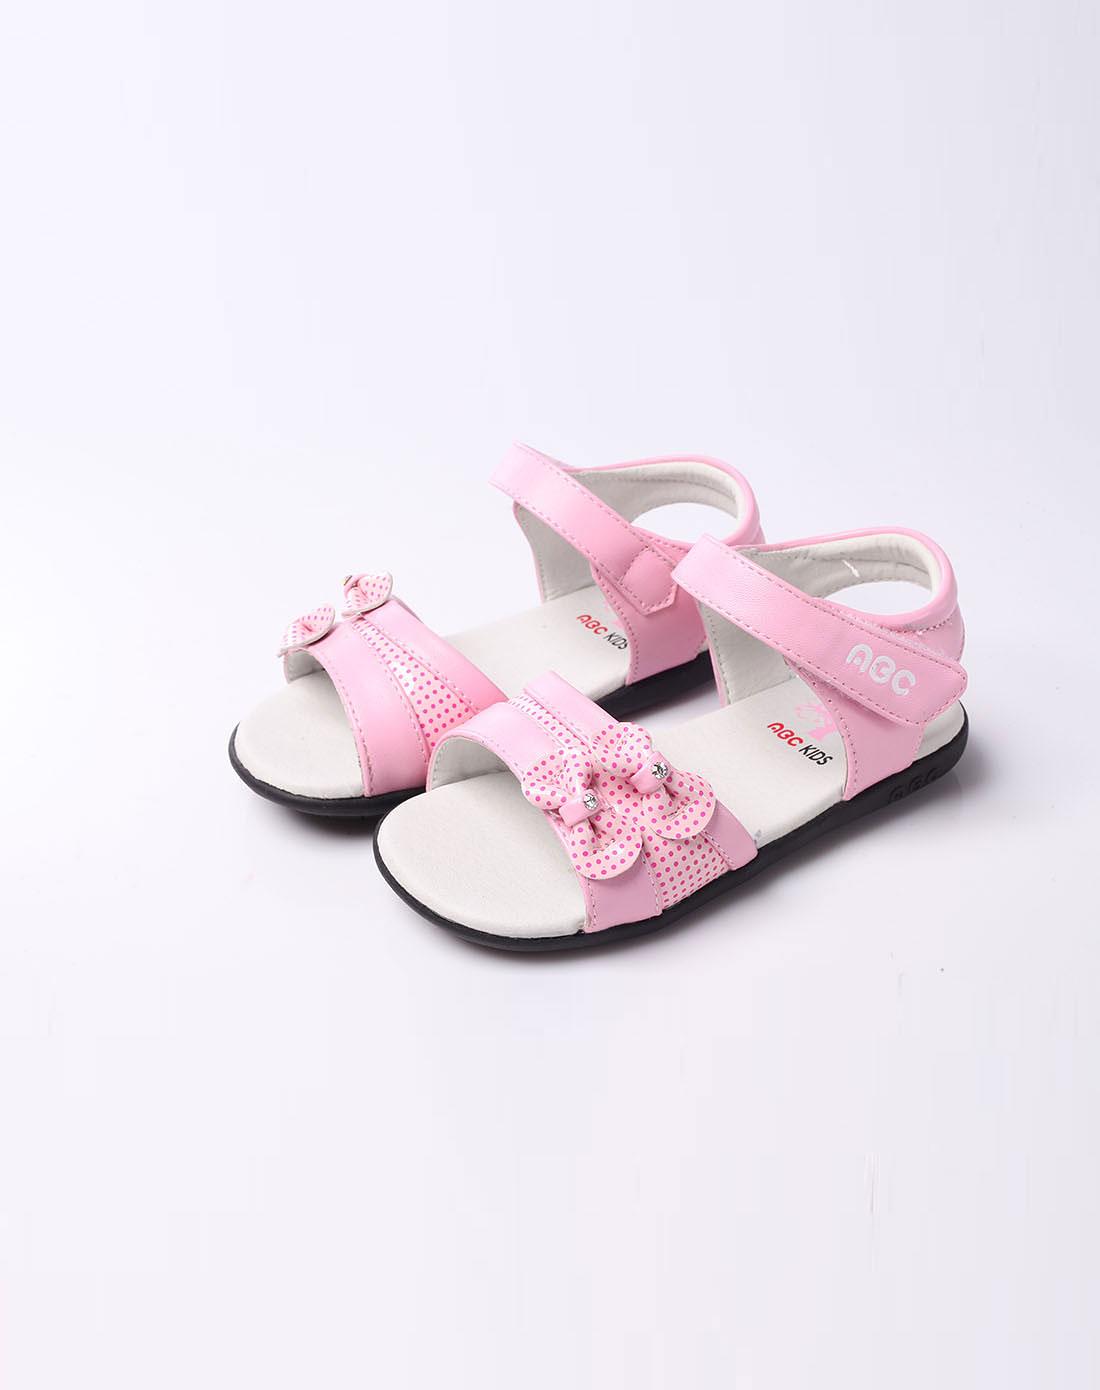 abckids男女童女宝宝粉色款皮凉鞋p22115515-6900